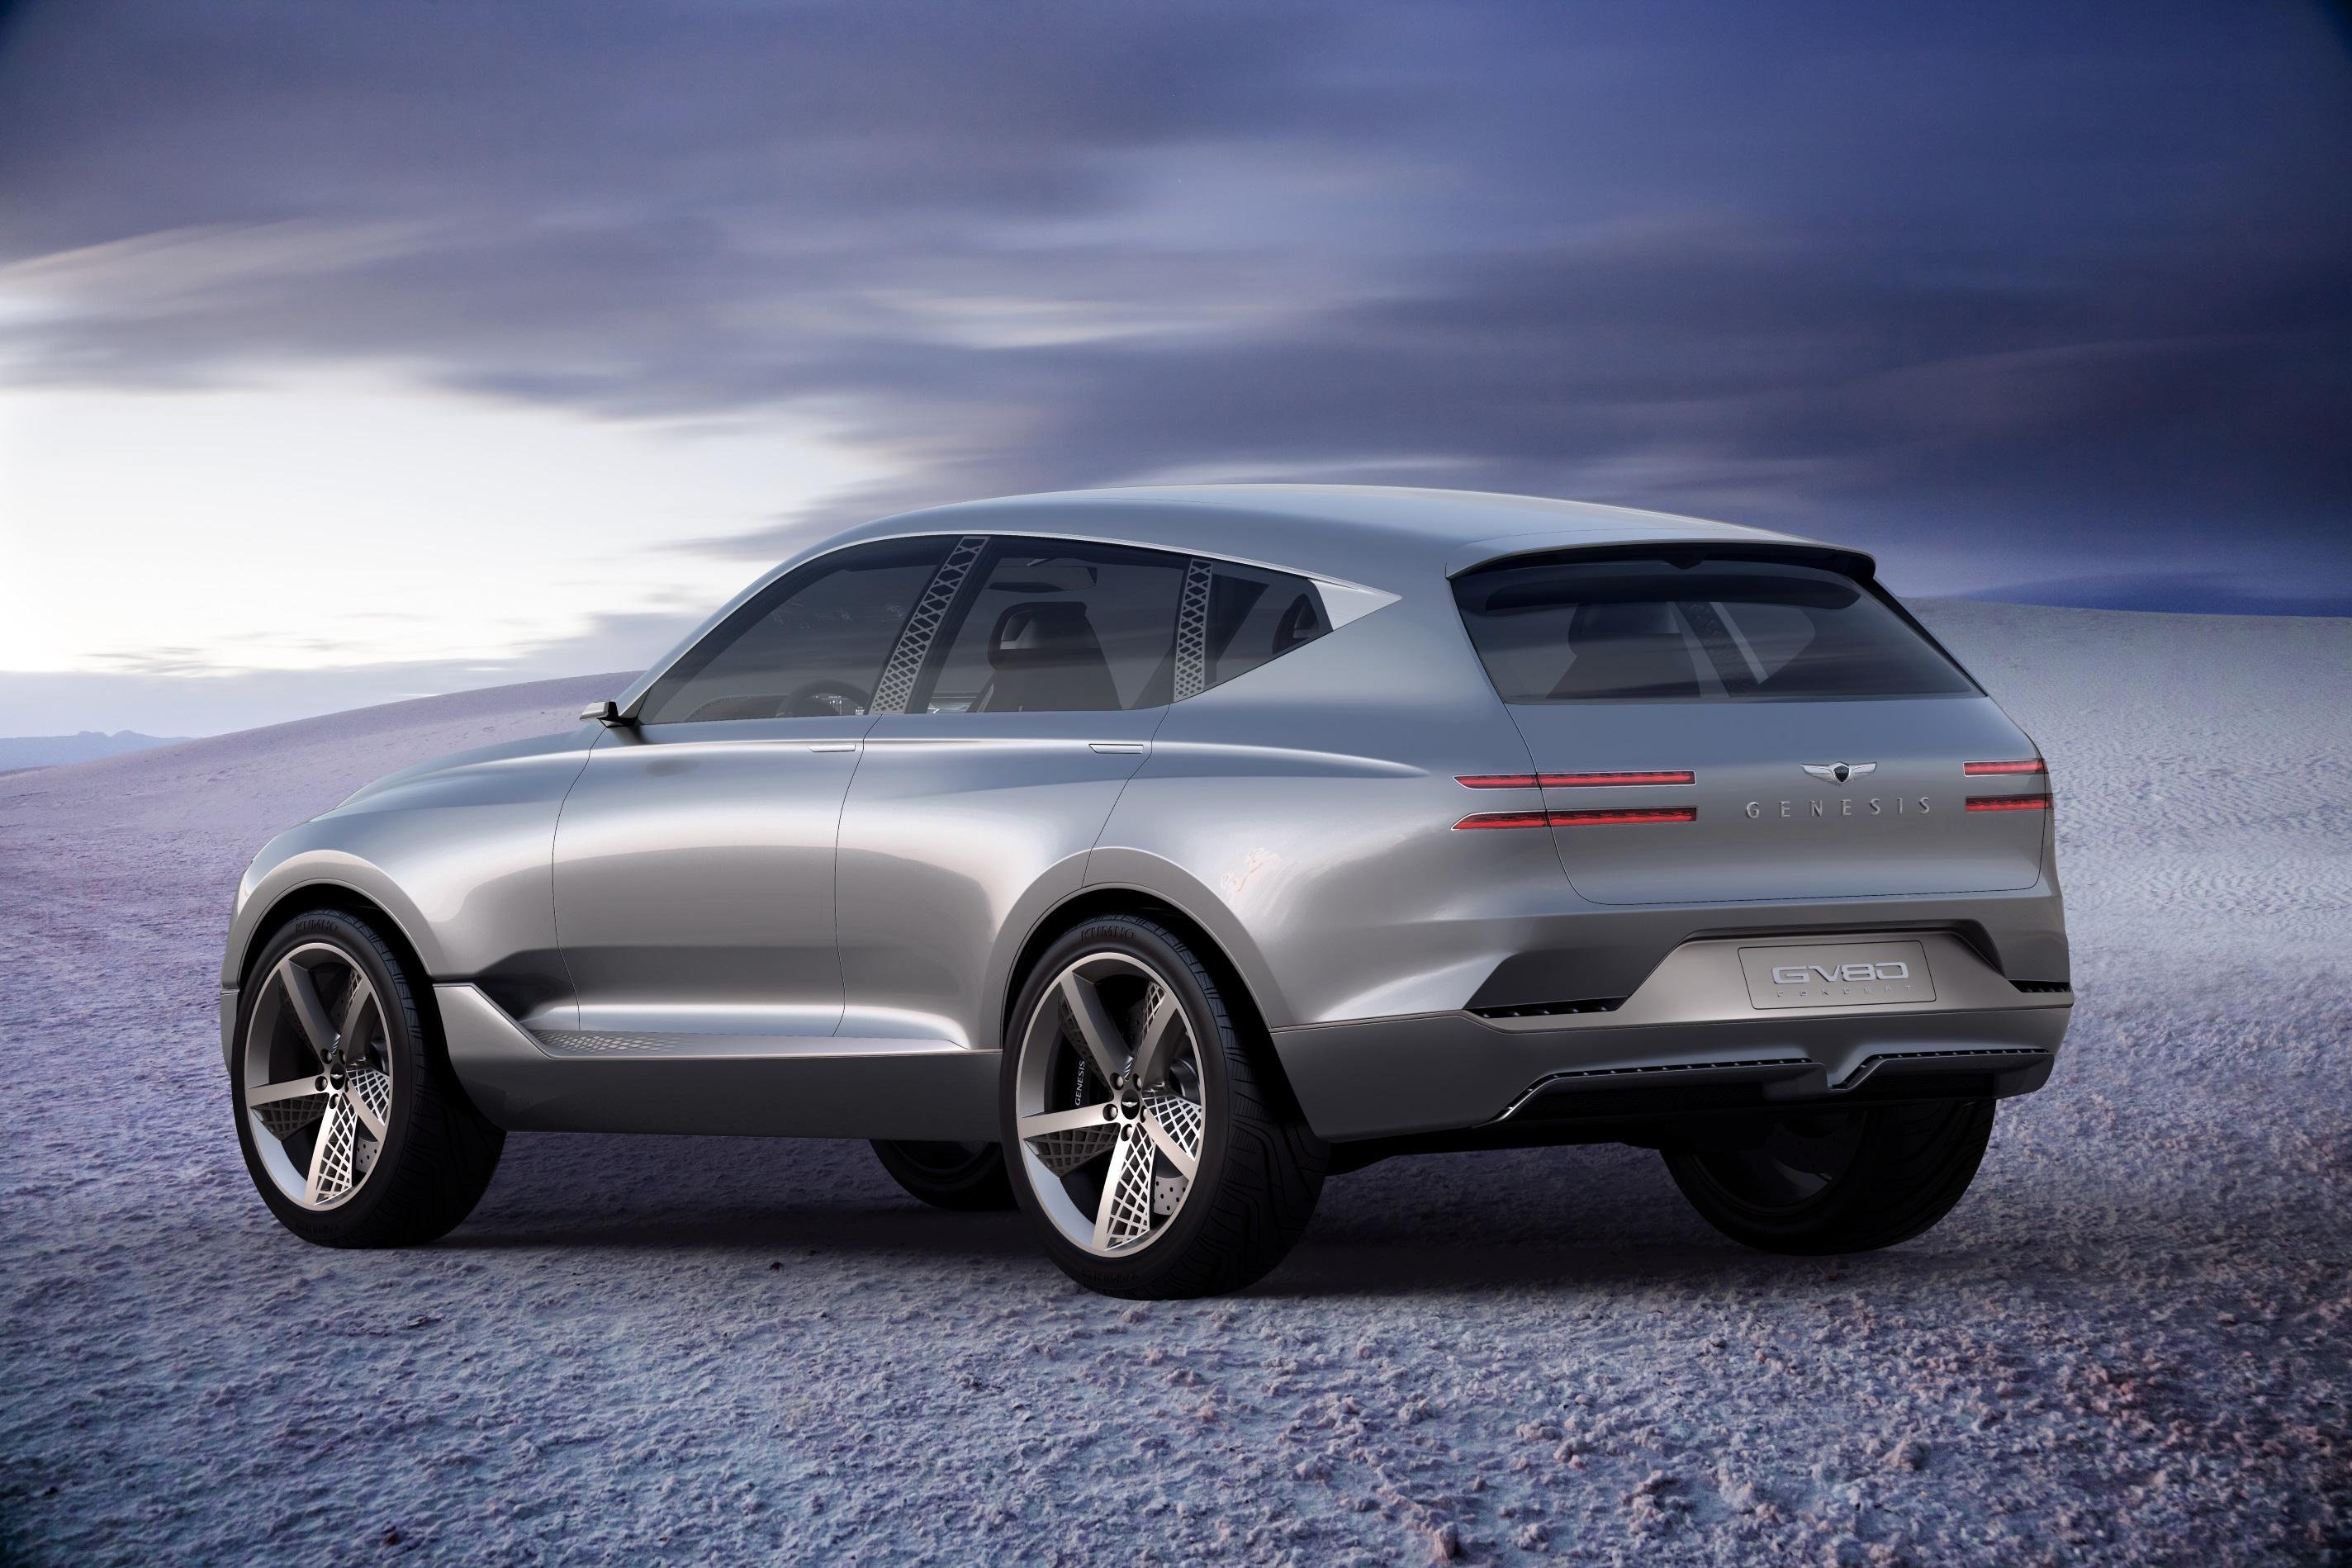 VWVortex.com - 2020 Genesis G90 Spied, Heavy Refresh with New Design Cues